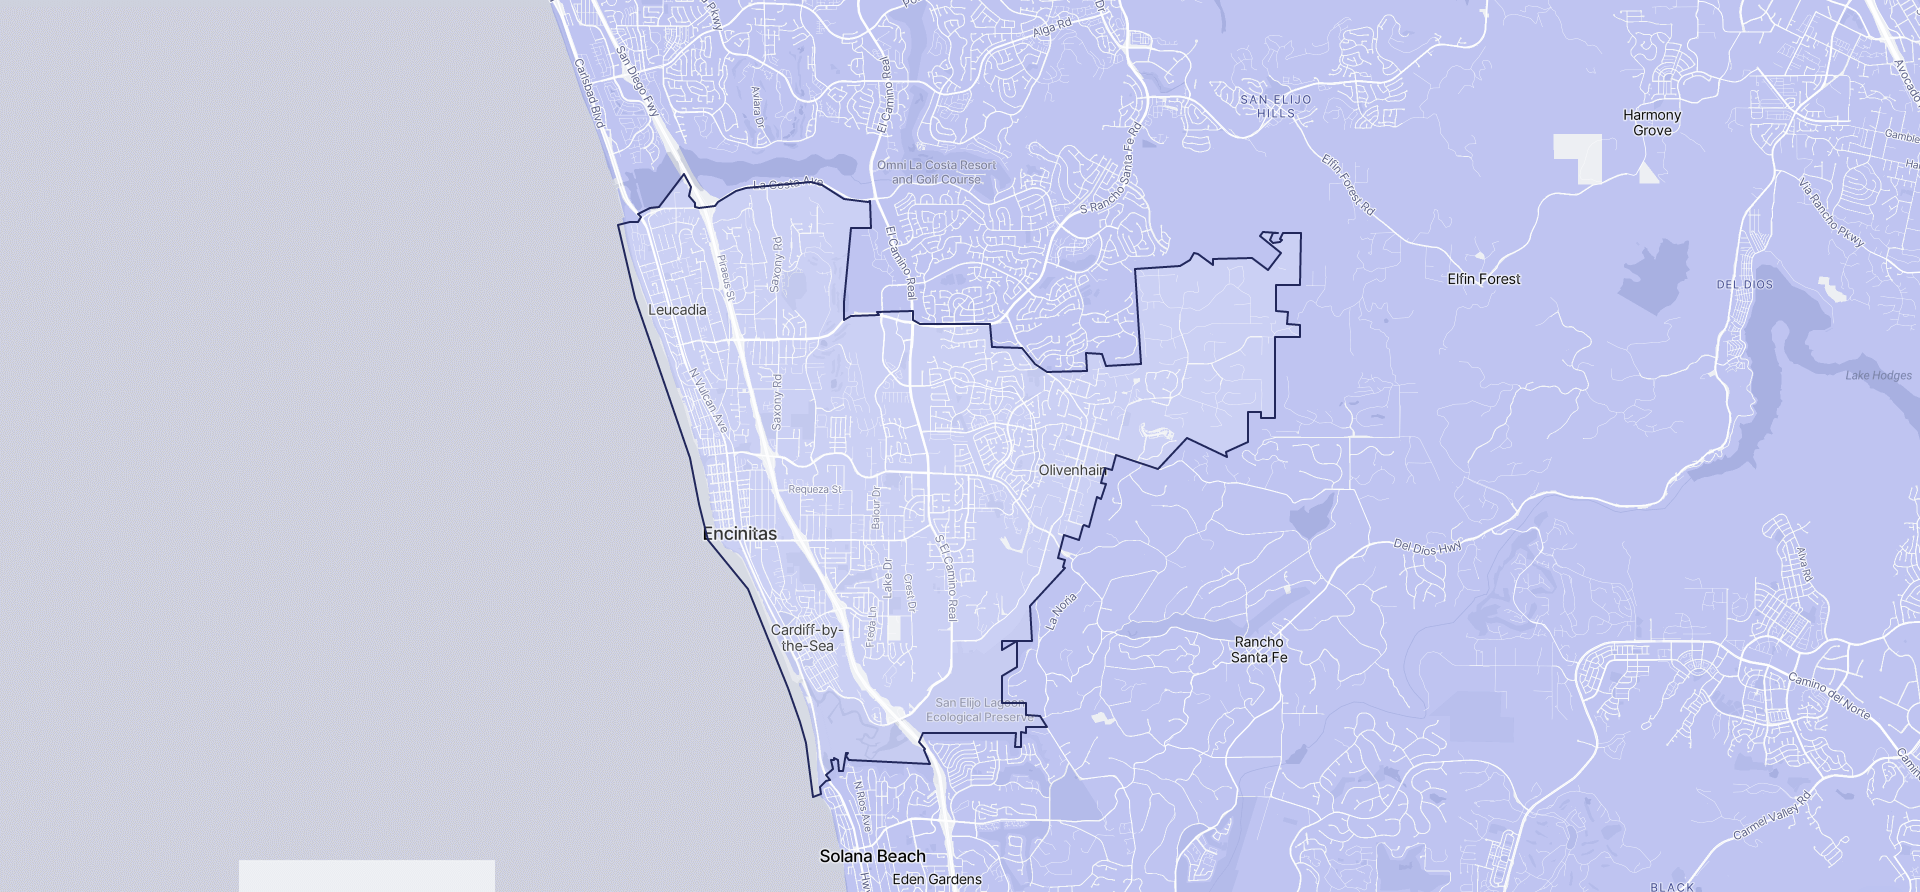 Image of Encinitas boundaries on a map.